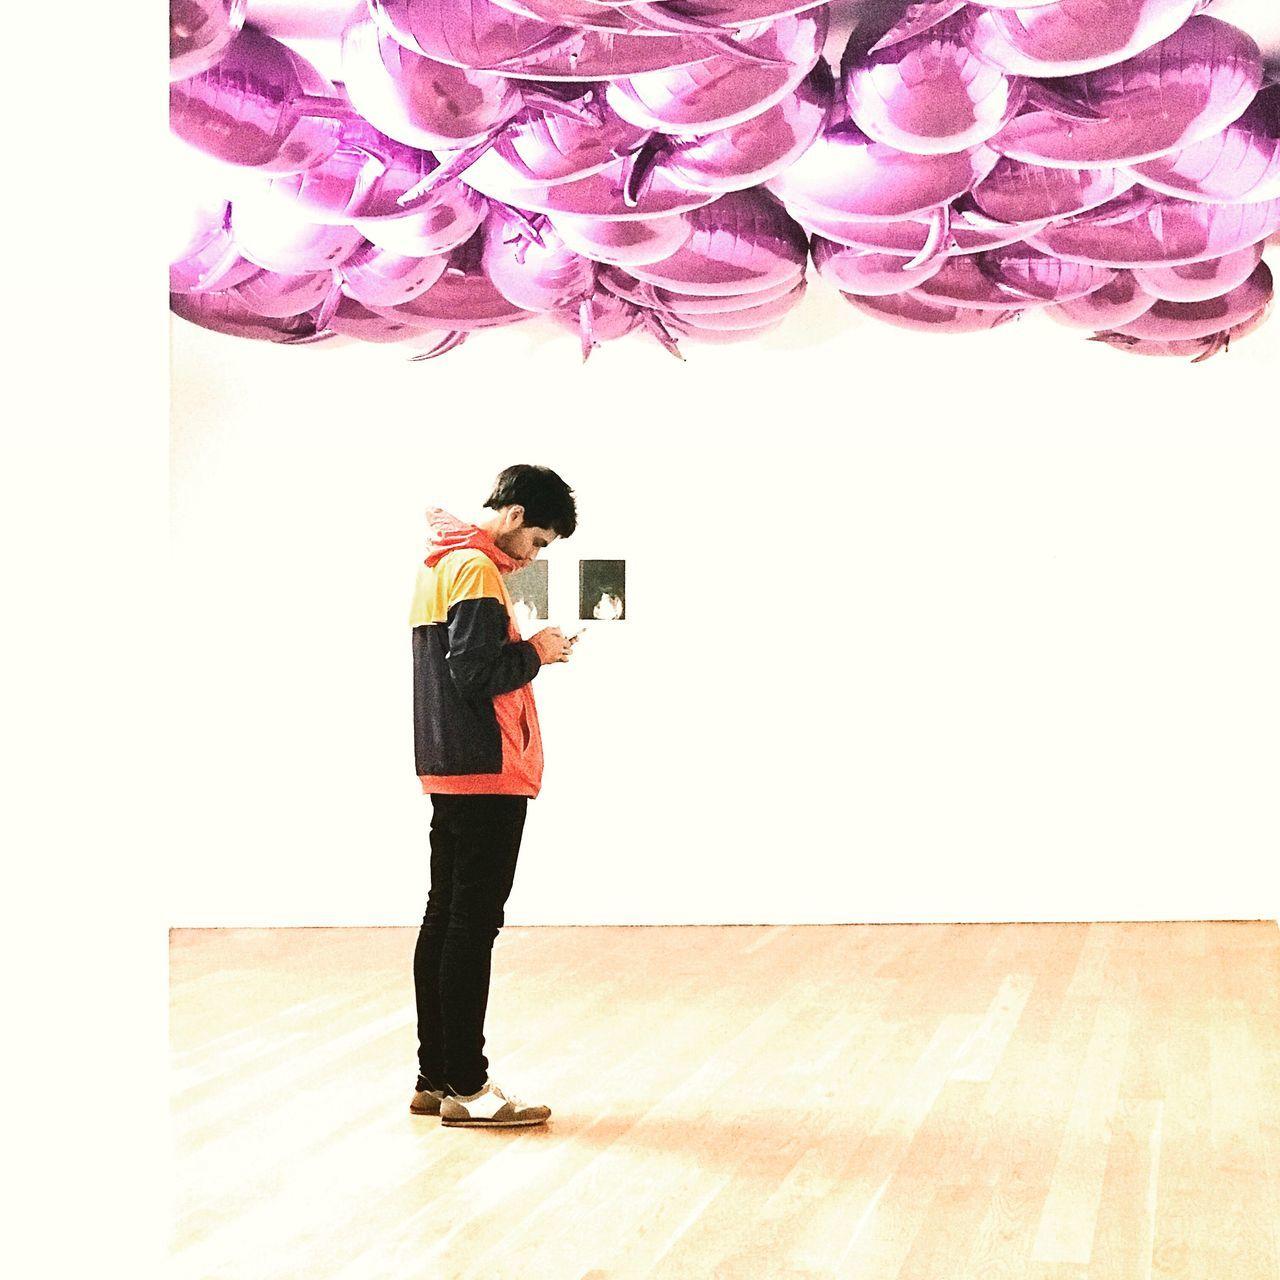 Shootermag_portugal Mobile_photographer EyeEm Porto Mobgraphia EyeEm Best Shots Lensculture Mob Fiction AMPt_community EyeEm Gallery IPhone 7 Plus Mobiography IPhone7Plus Contests Youmobile EyeEmBestPics EyeEm Best Edits Serralves